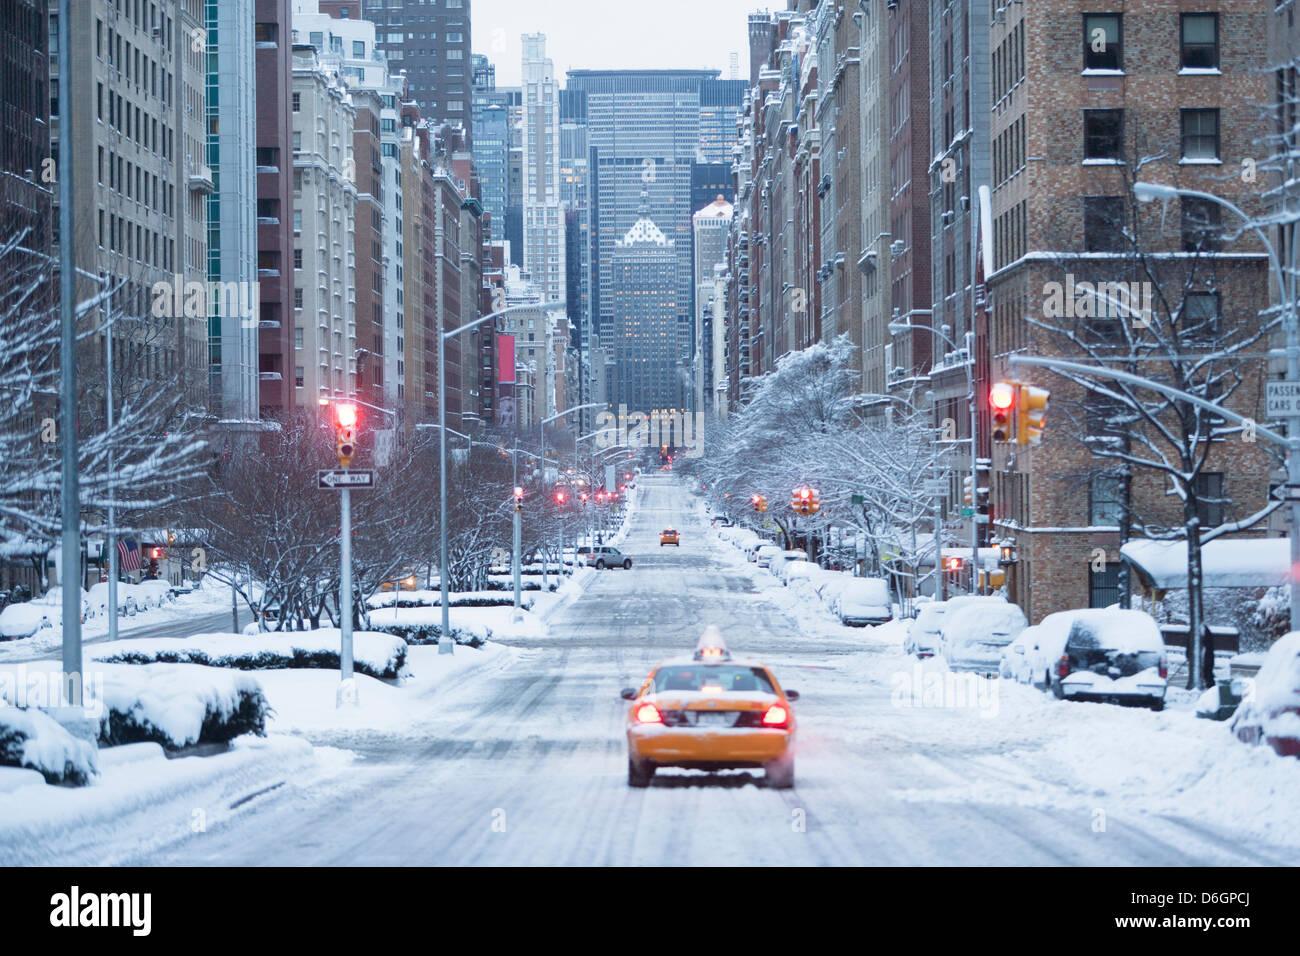 taxi on snowy city street stock photo 55687874 alamy